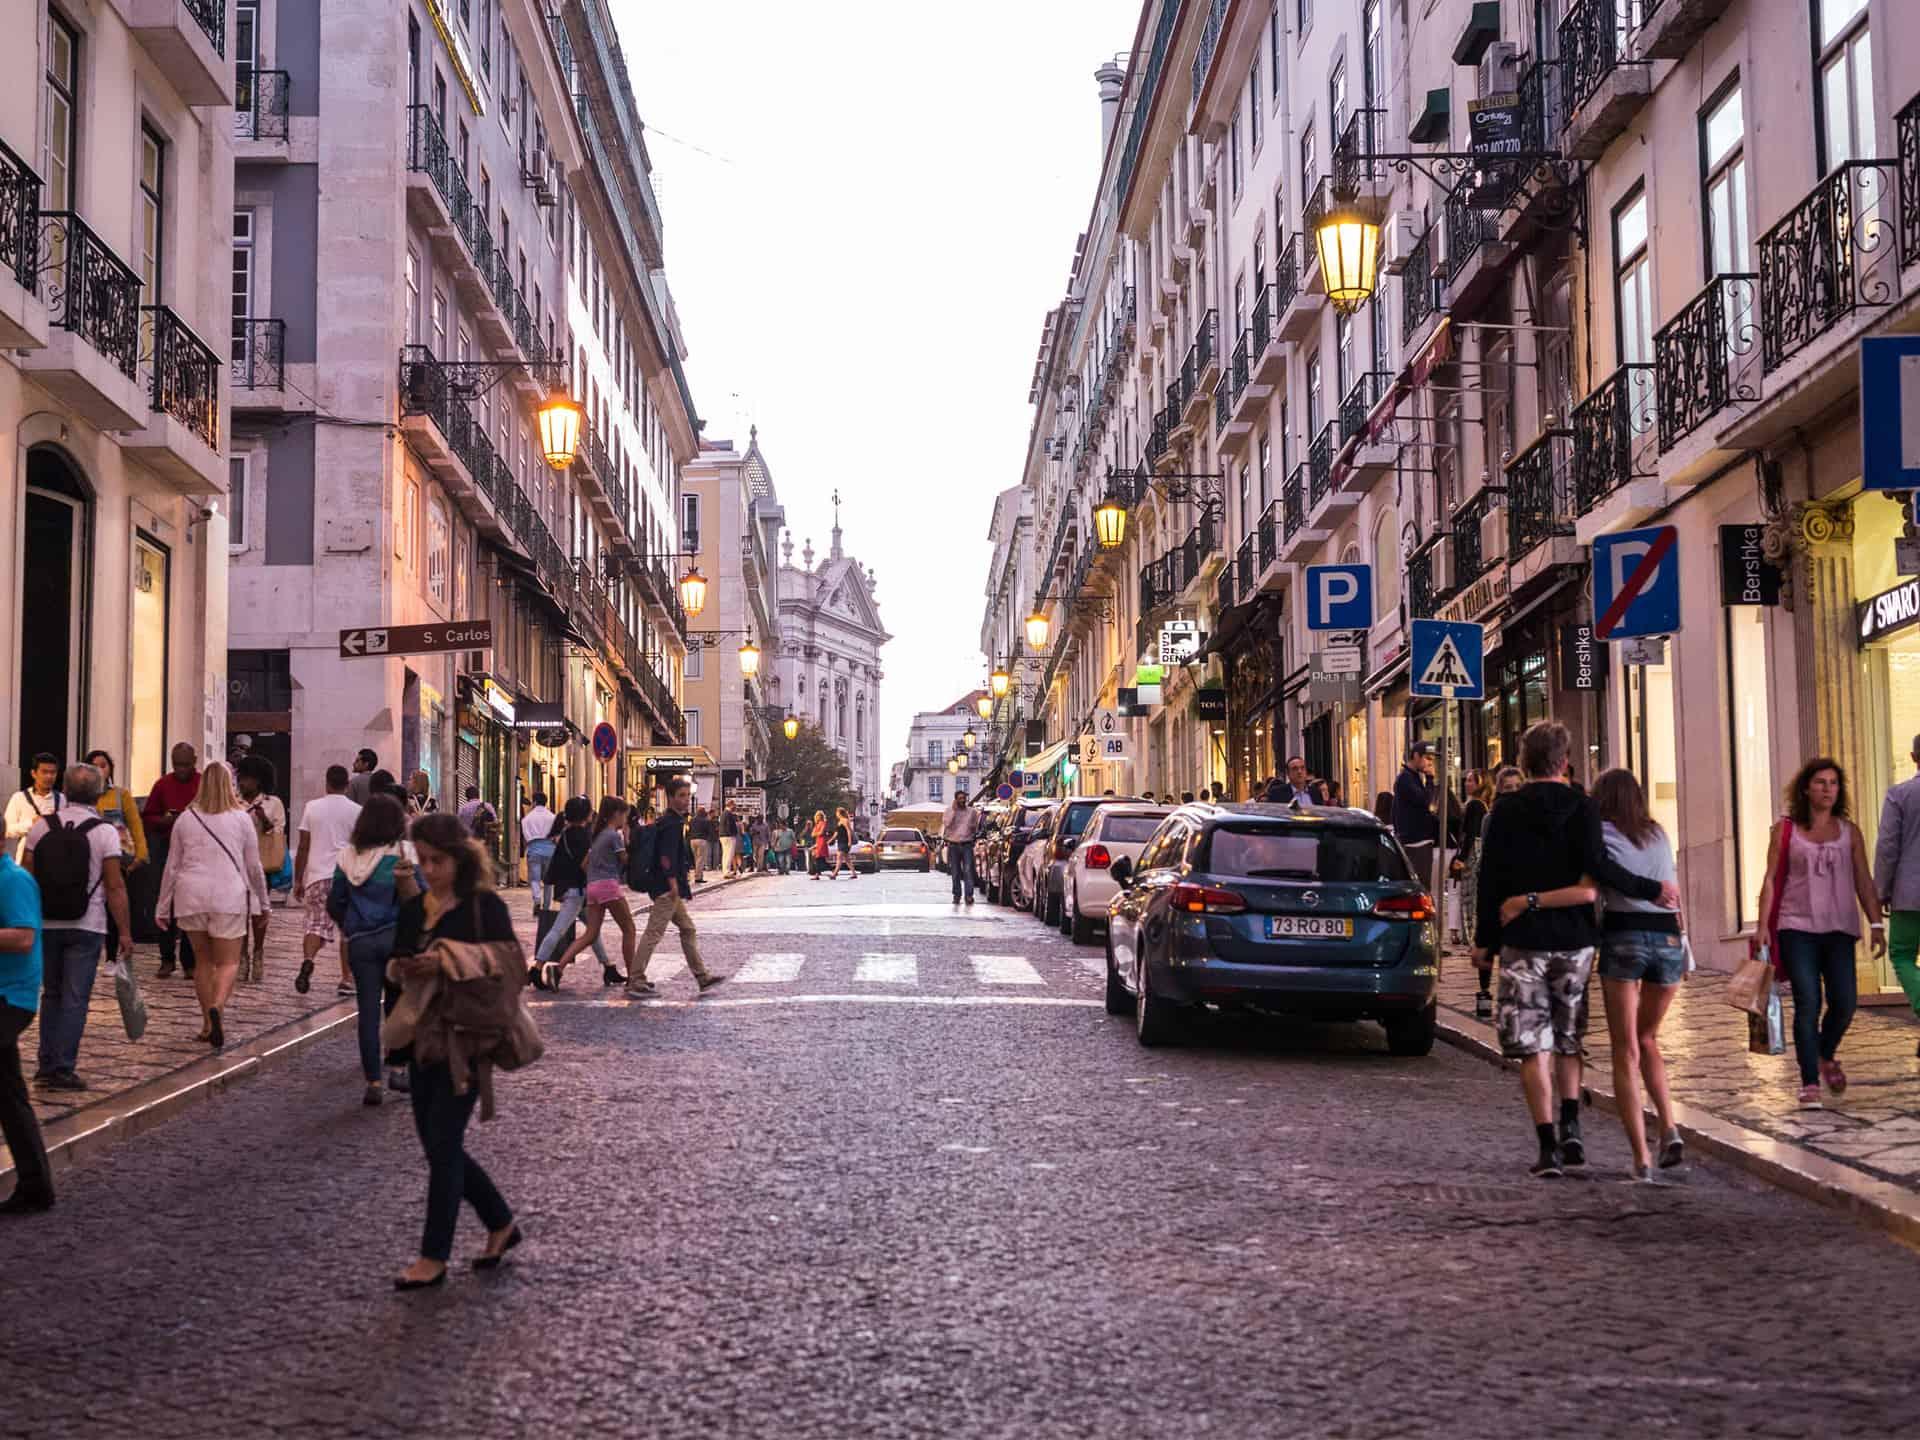 Chiado, Lisbon's Montmartre